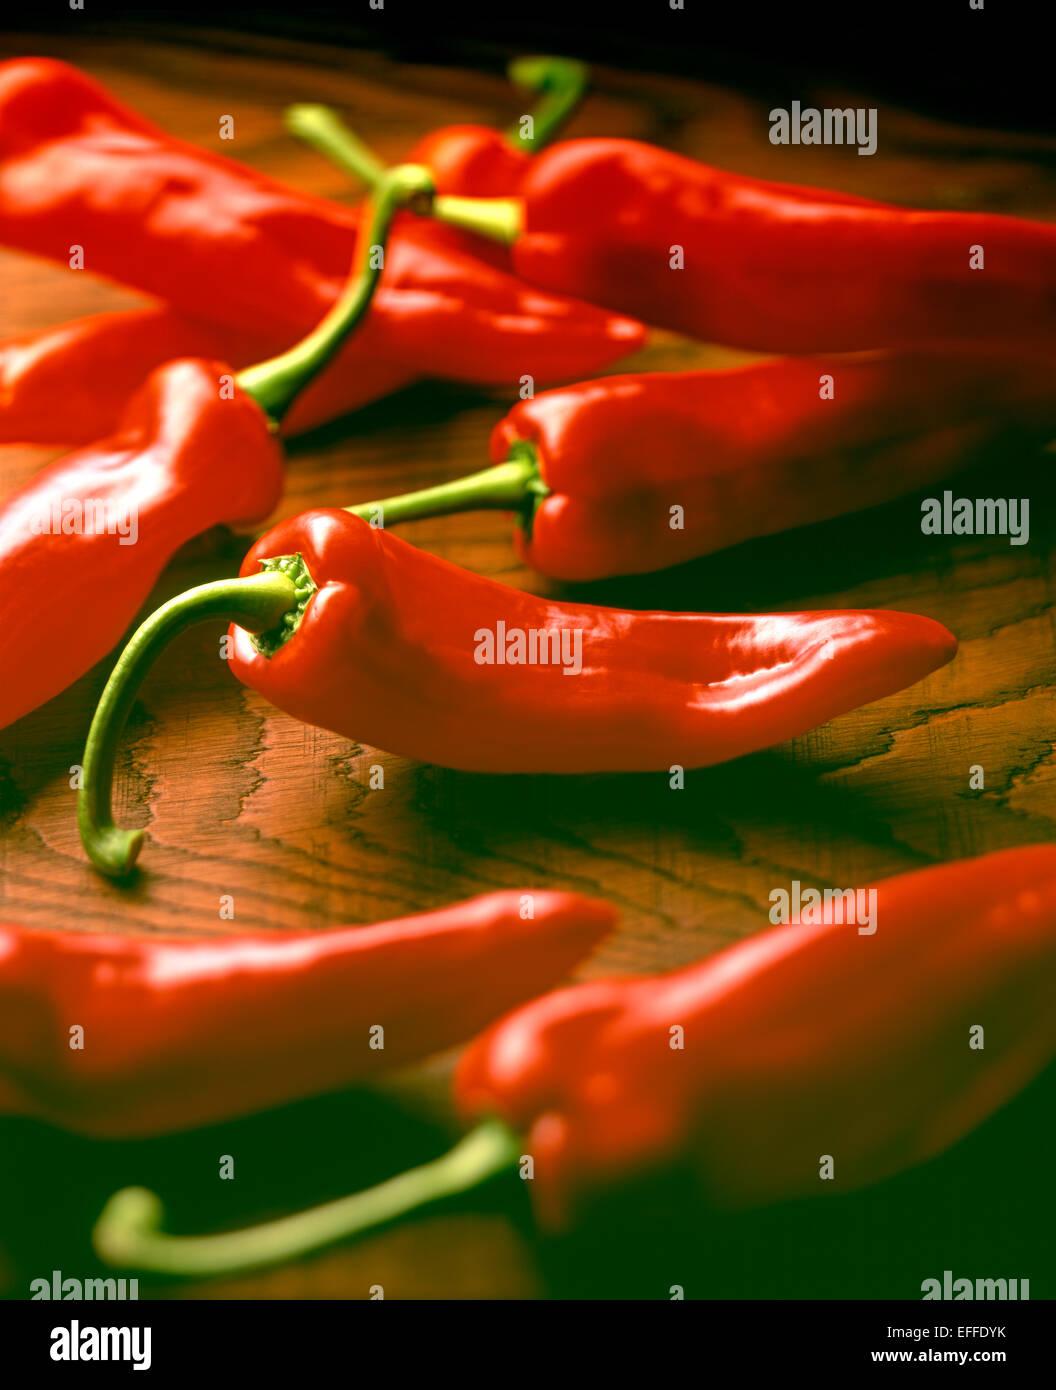 Ramiro poivrons rouges Photo Stock